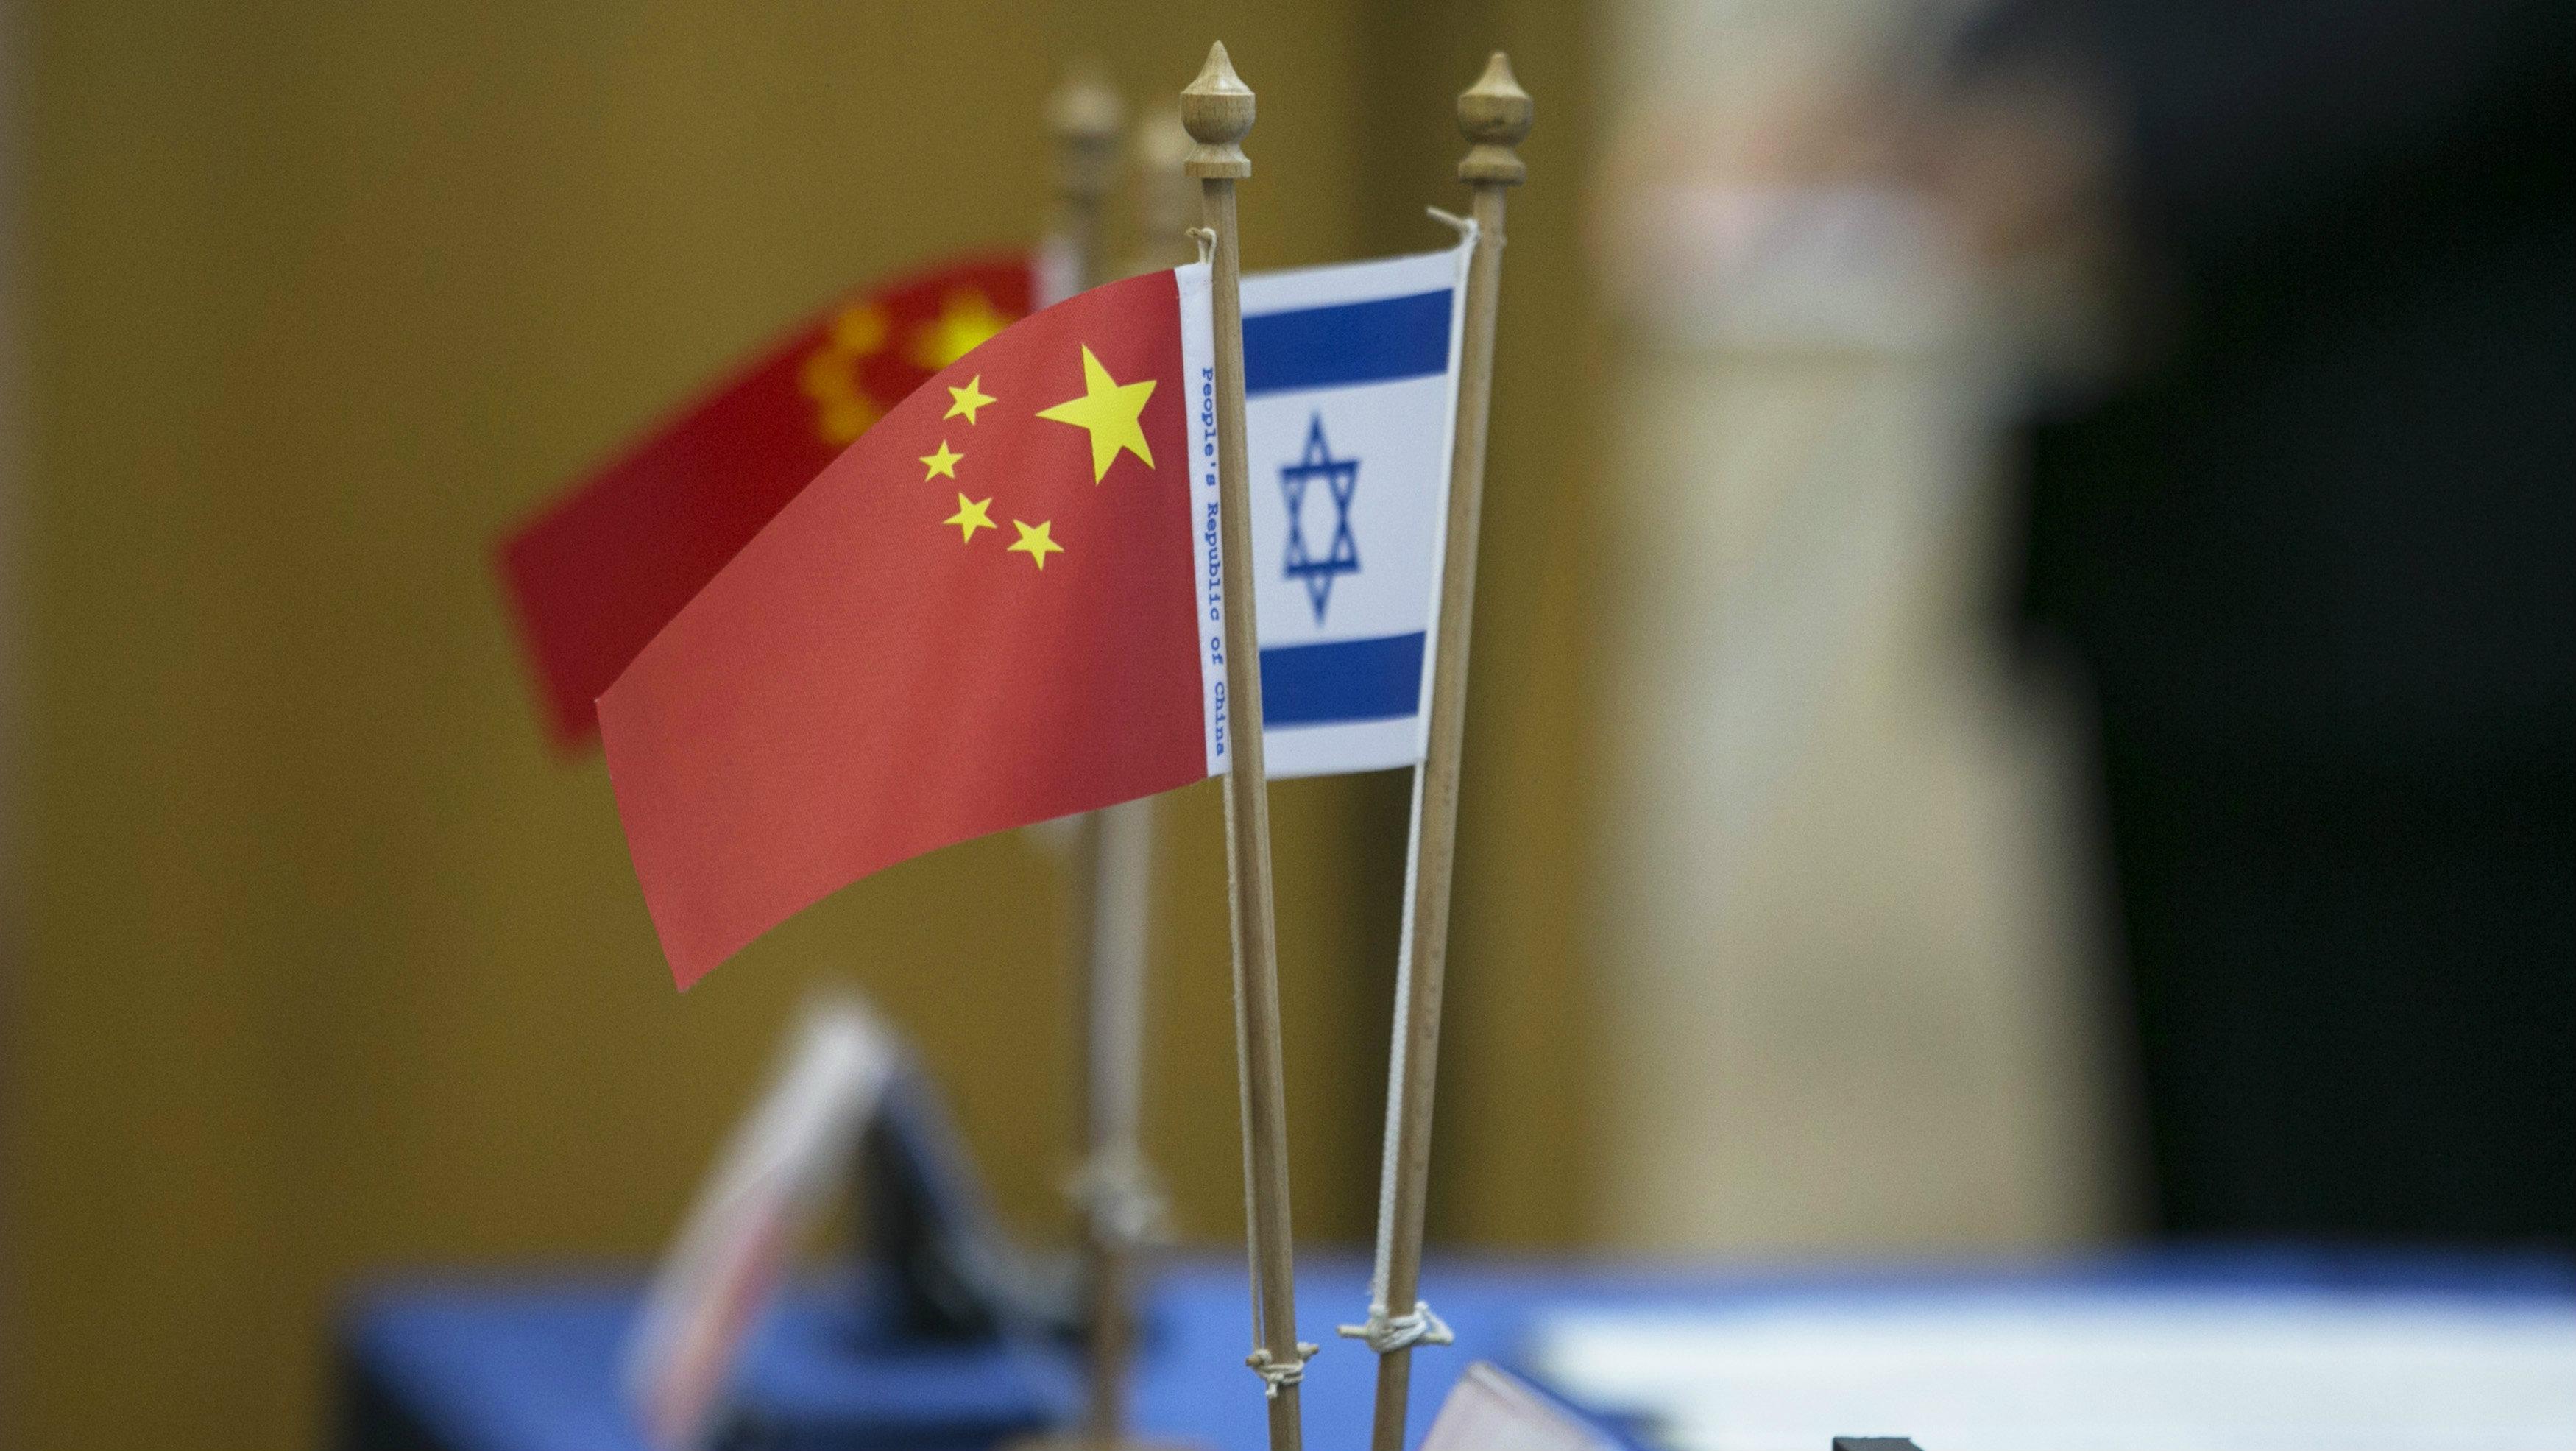 Israels Very Popular On Weibothanks To Chinas Online Islamophobia